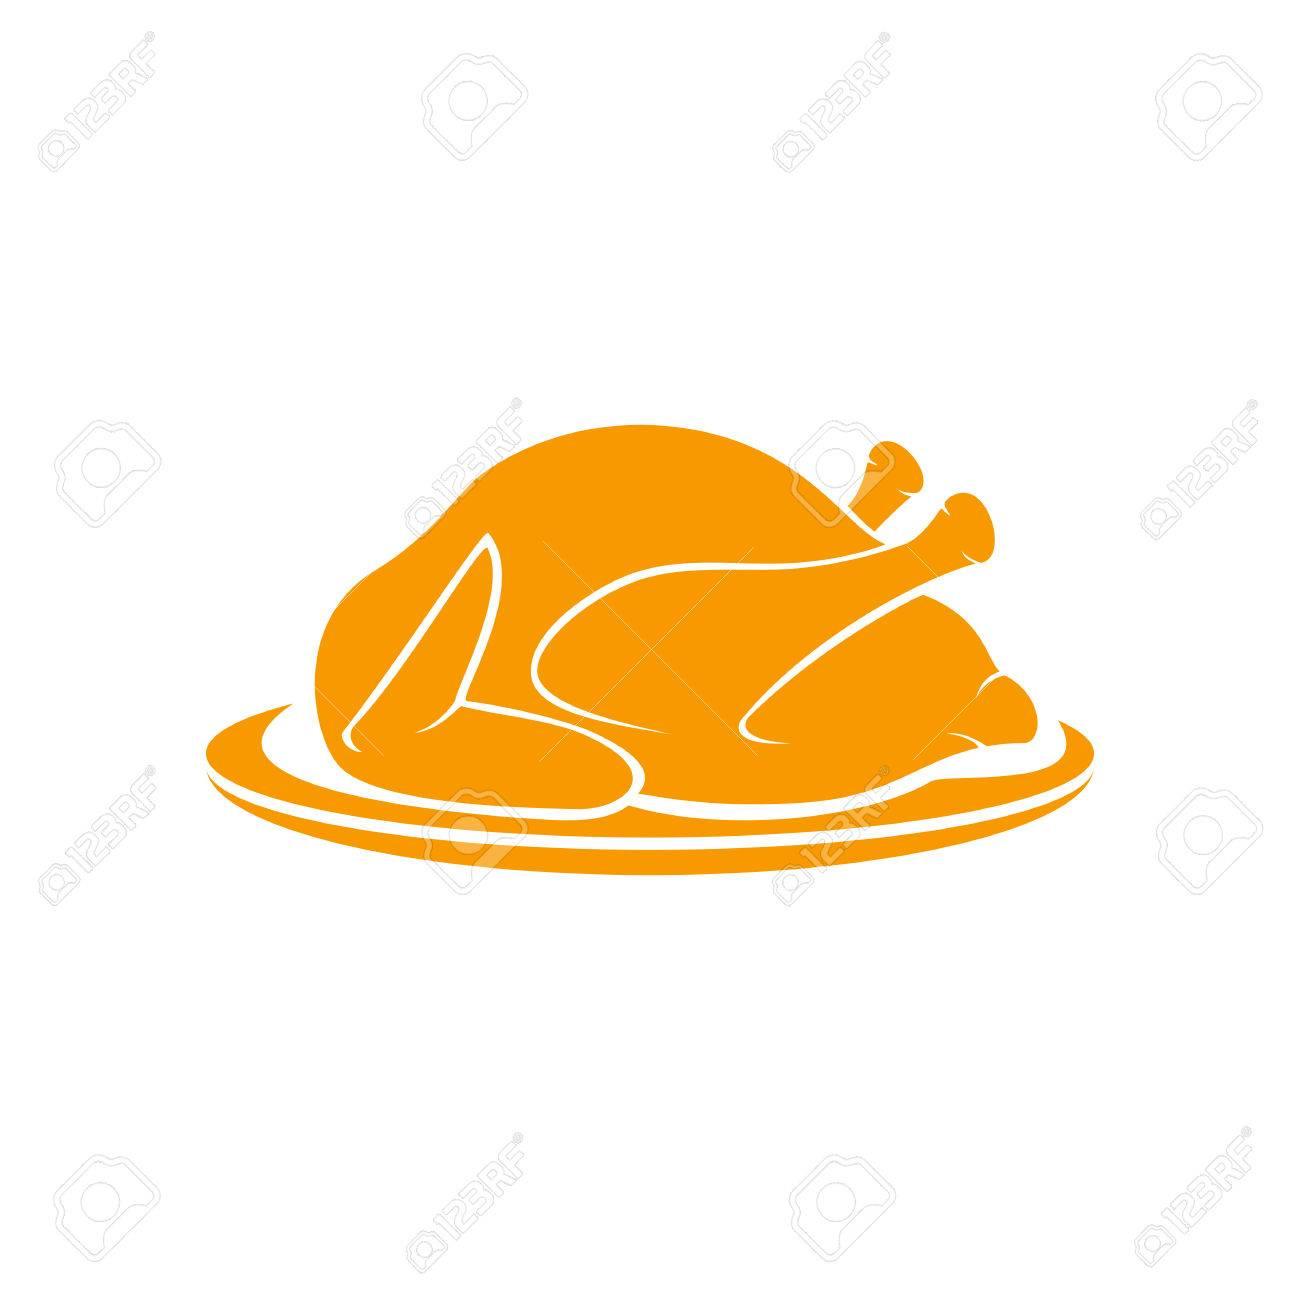 Roast turkey on plate isolated on white background, illustration. - 46099088